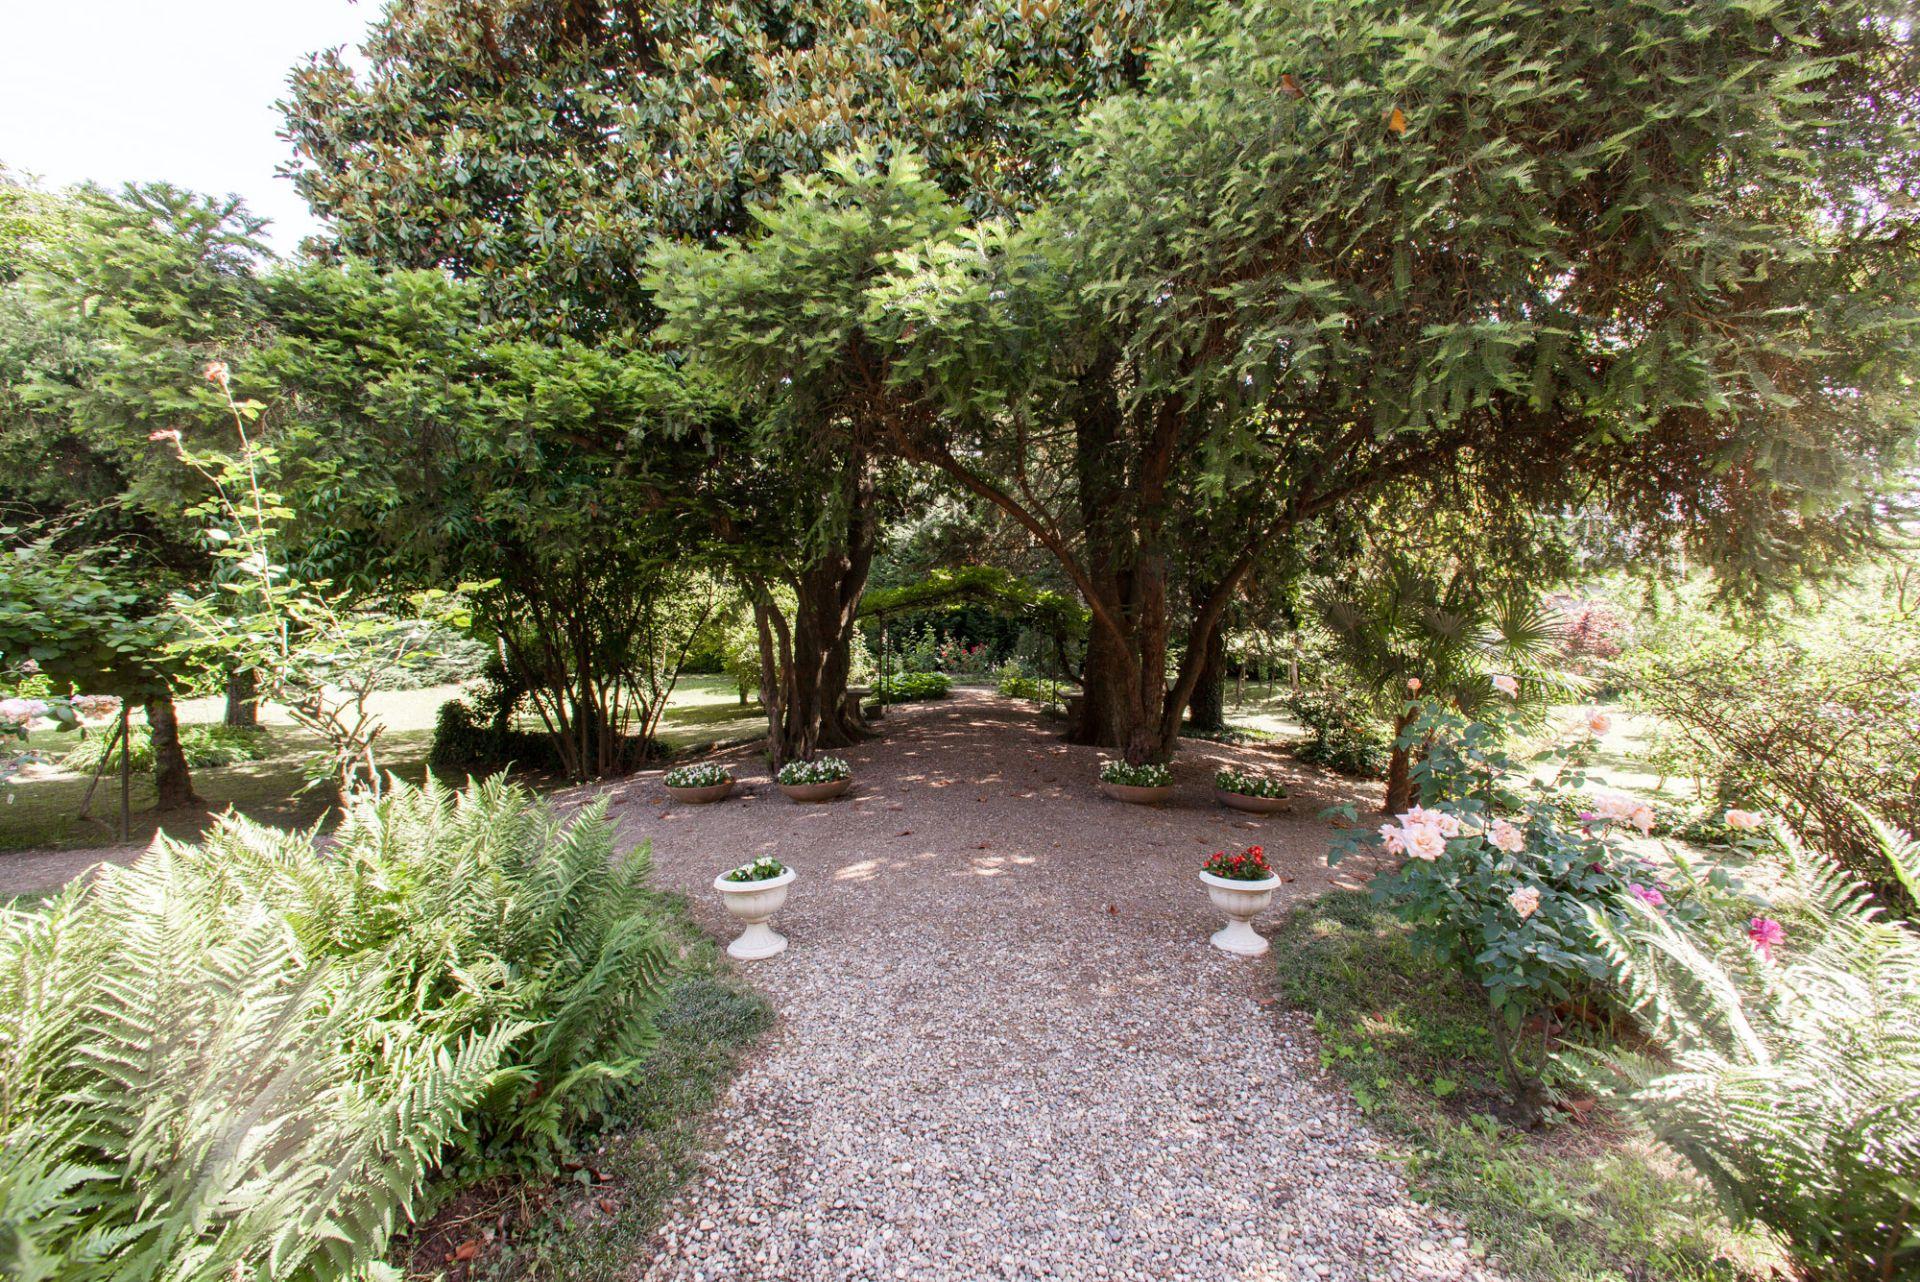 Emejing giardino in terrazza pictures house design ideas - Terrazzo giardino ...